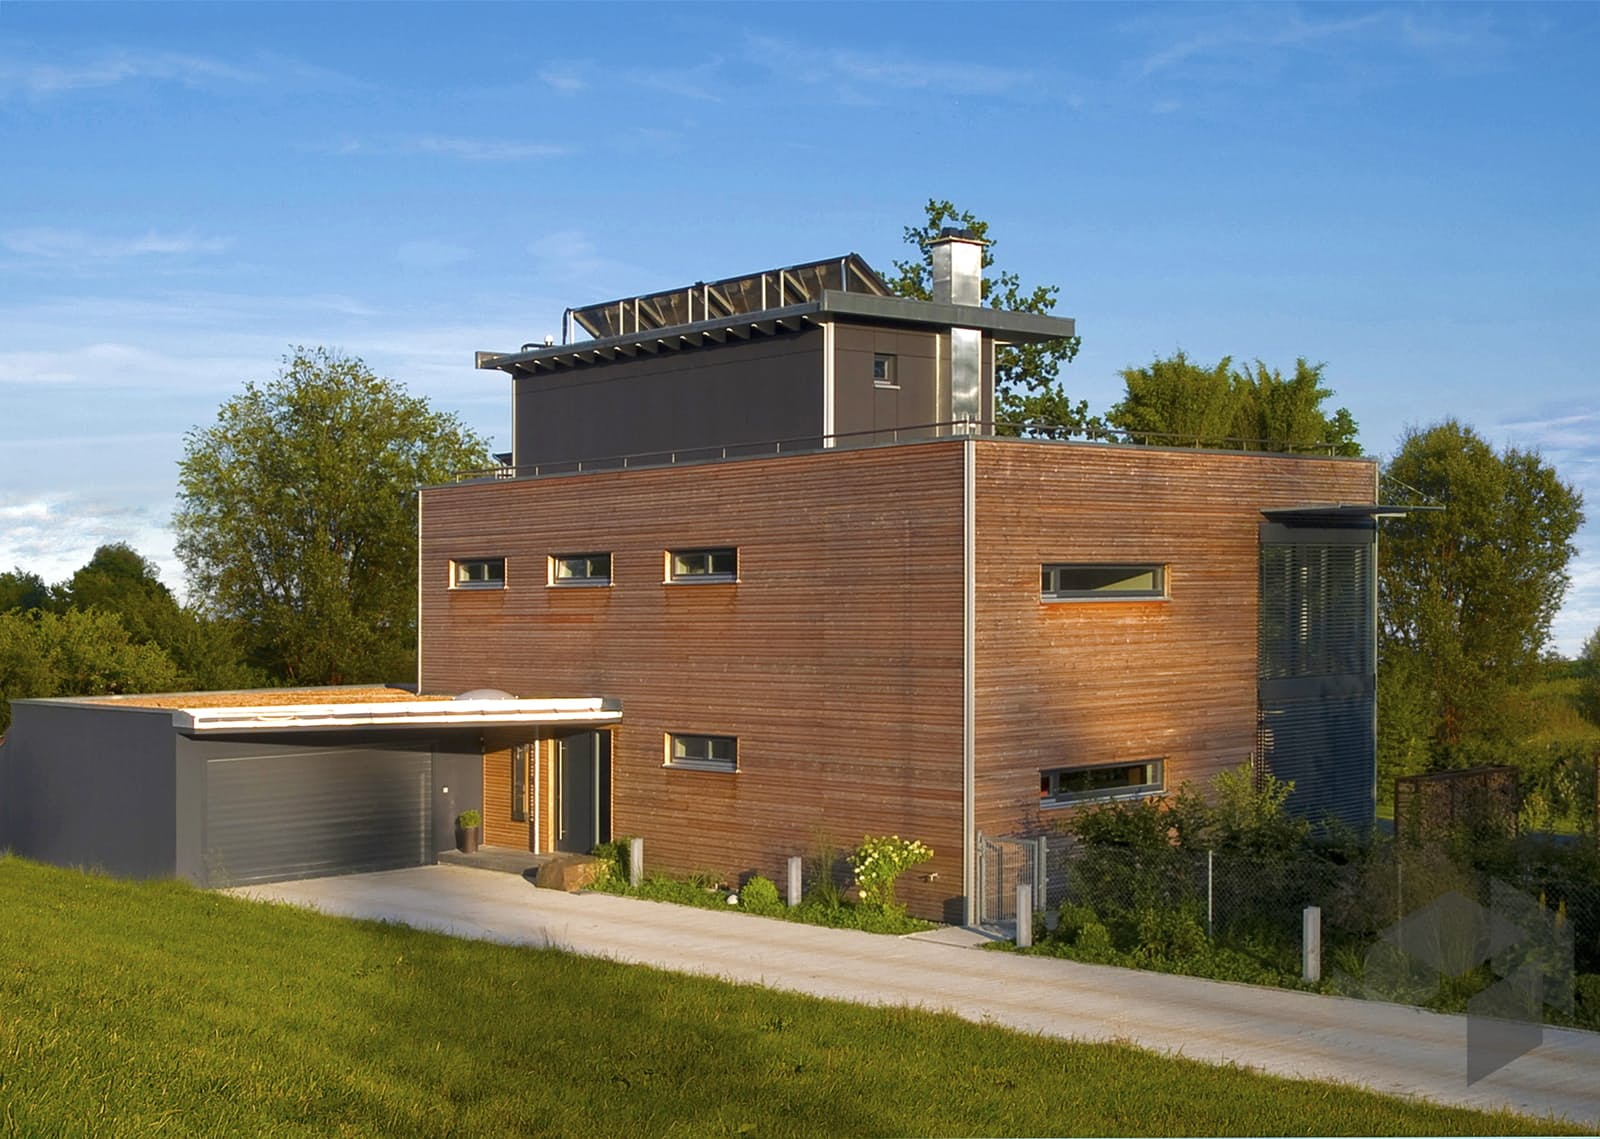 Individuelle planung modern living von baufritz for Fertighaus modern